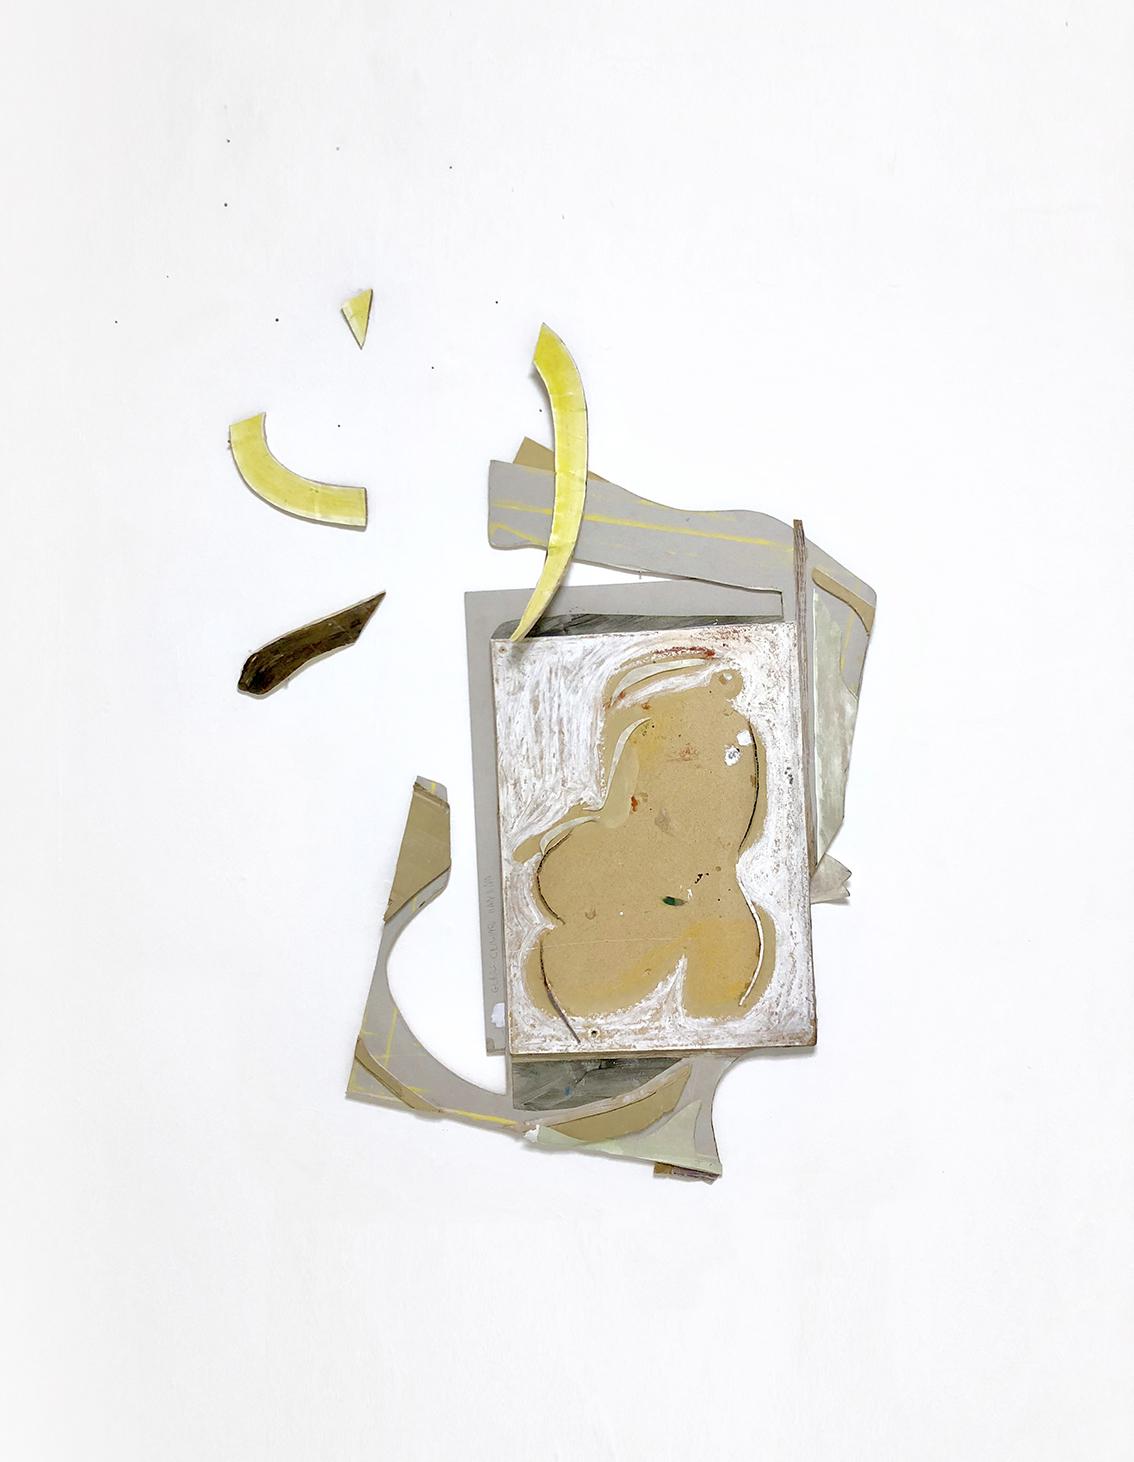 PLOP Residency- Lucille Uhlrich - glass ceiling bananaleger.jpg